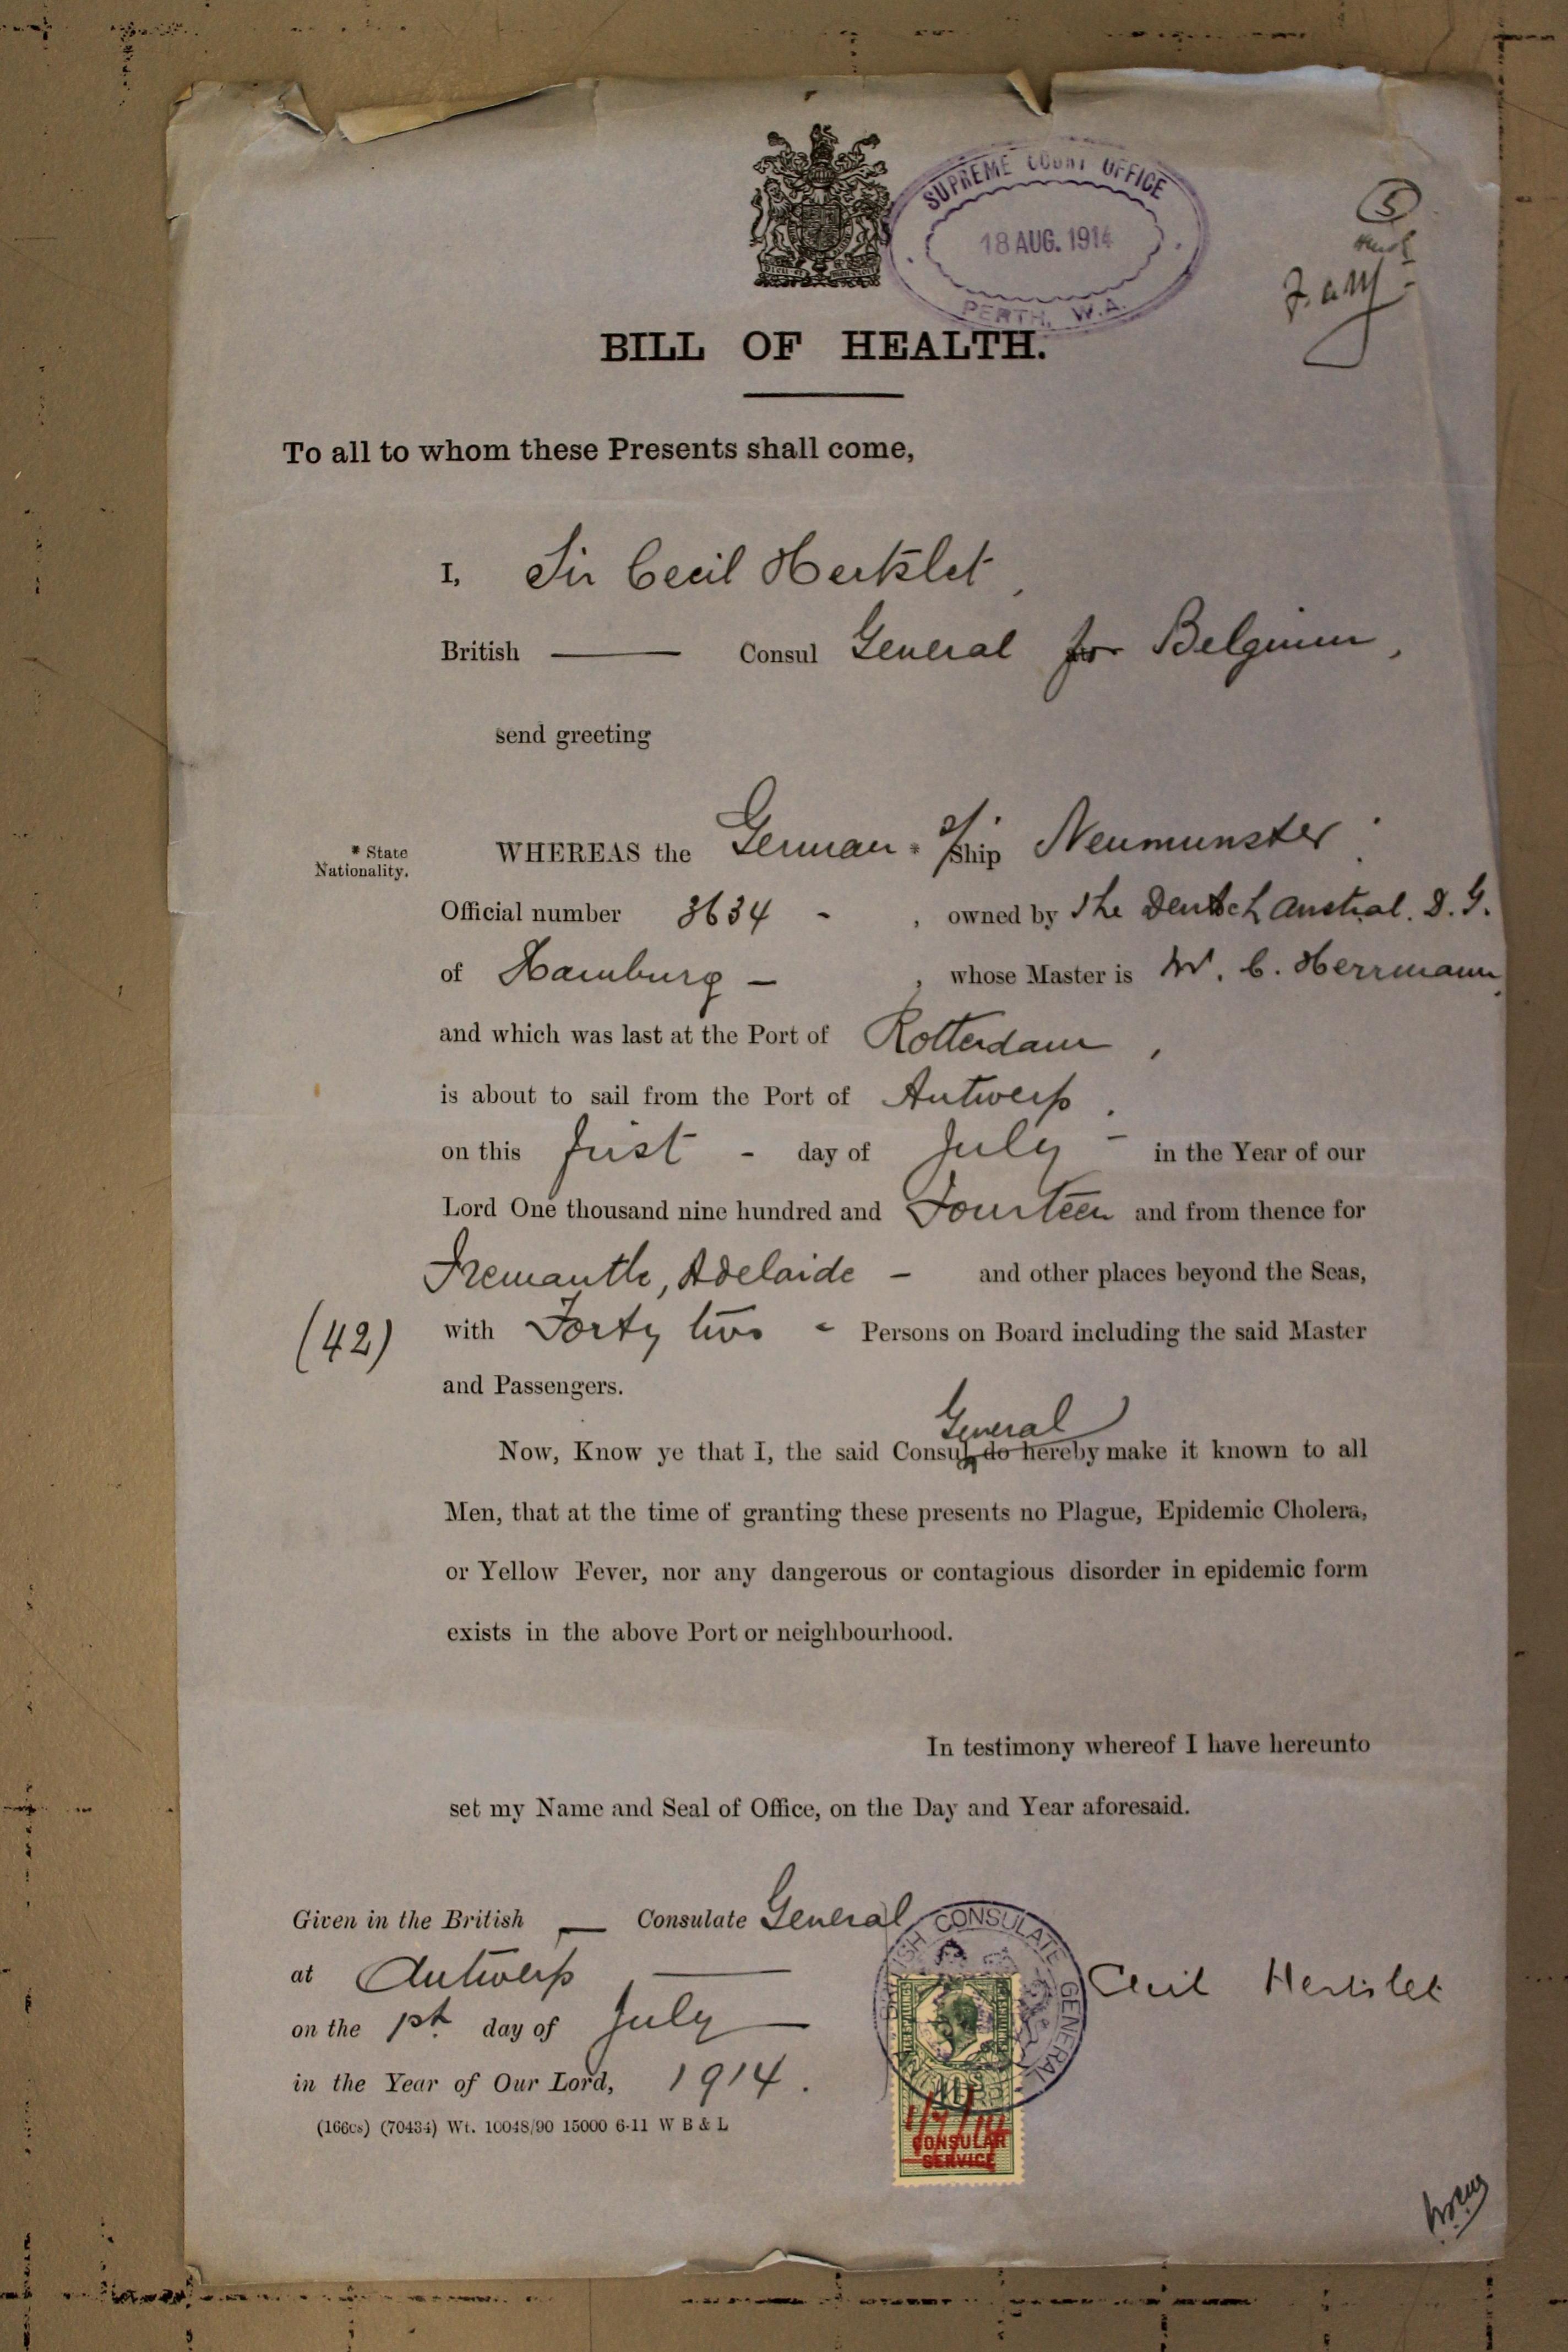 Bill of Health 1914